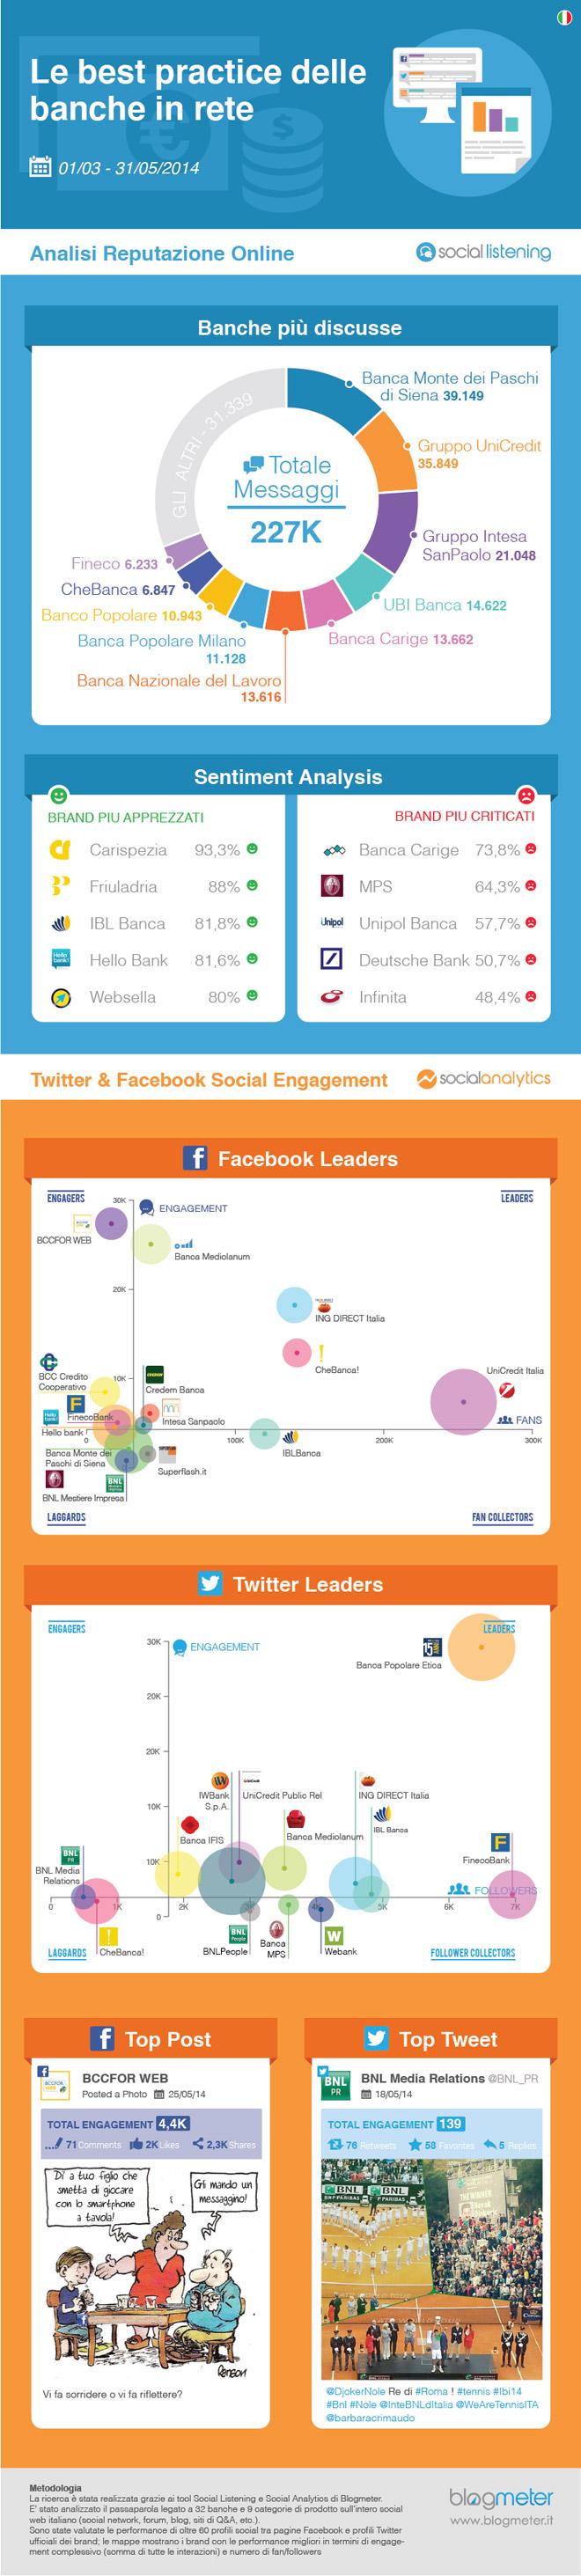 banche-social-media-infografica